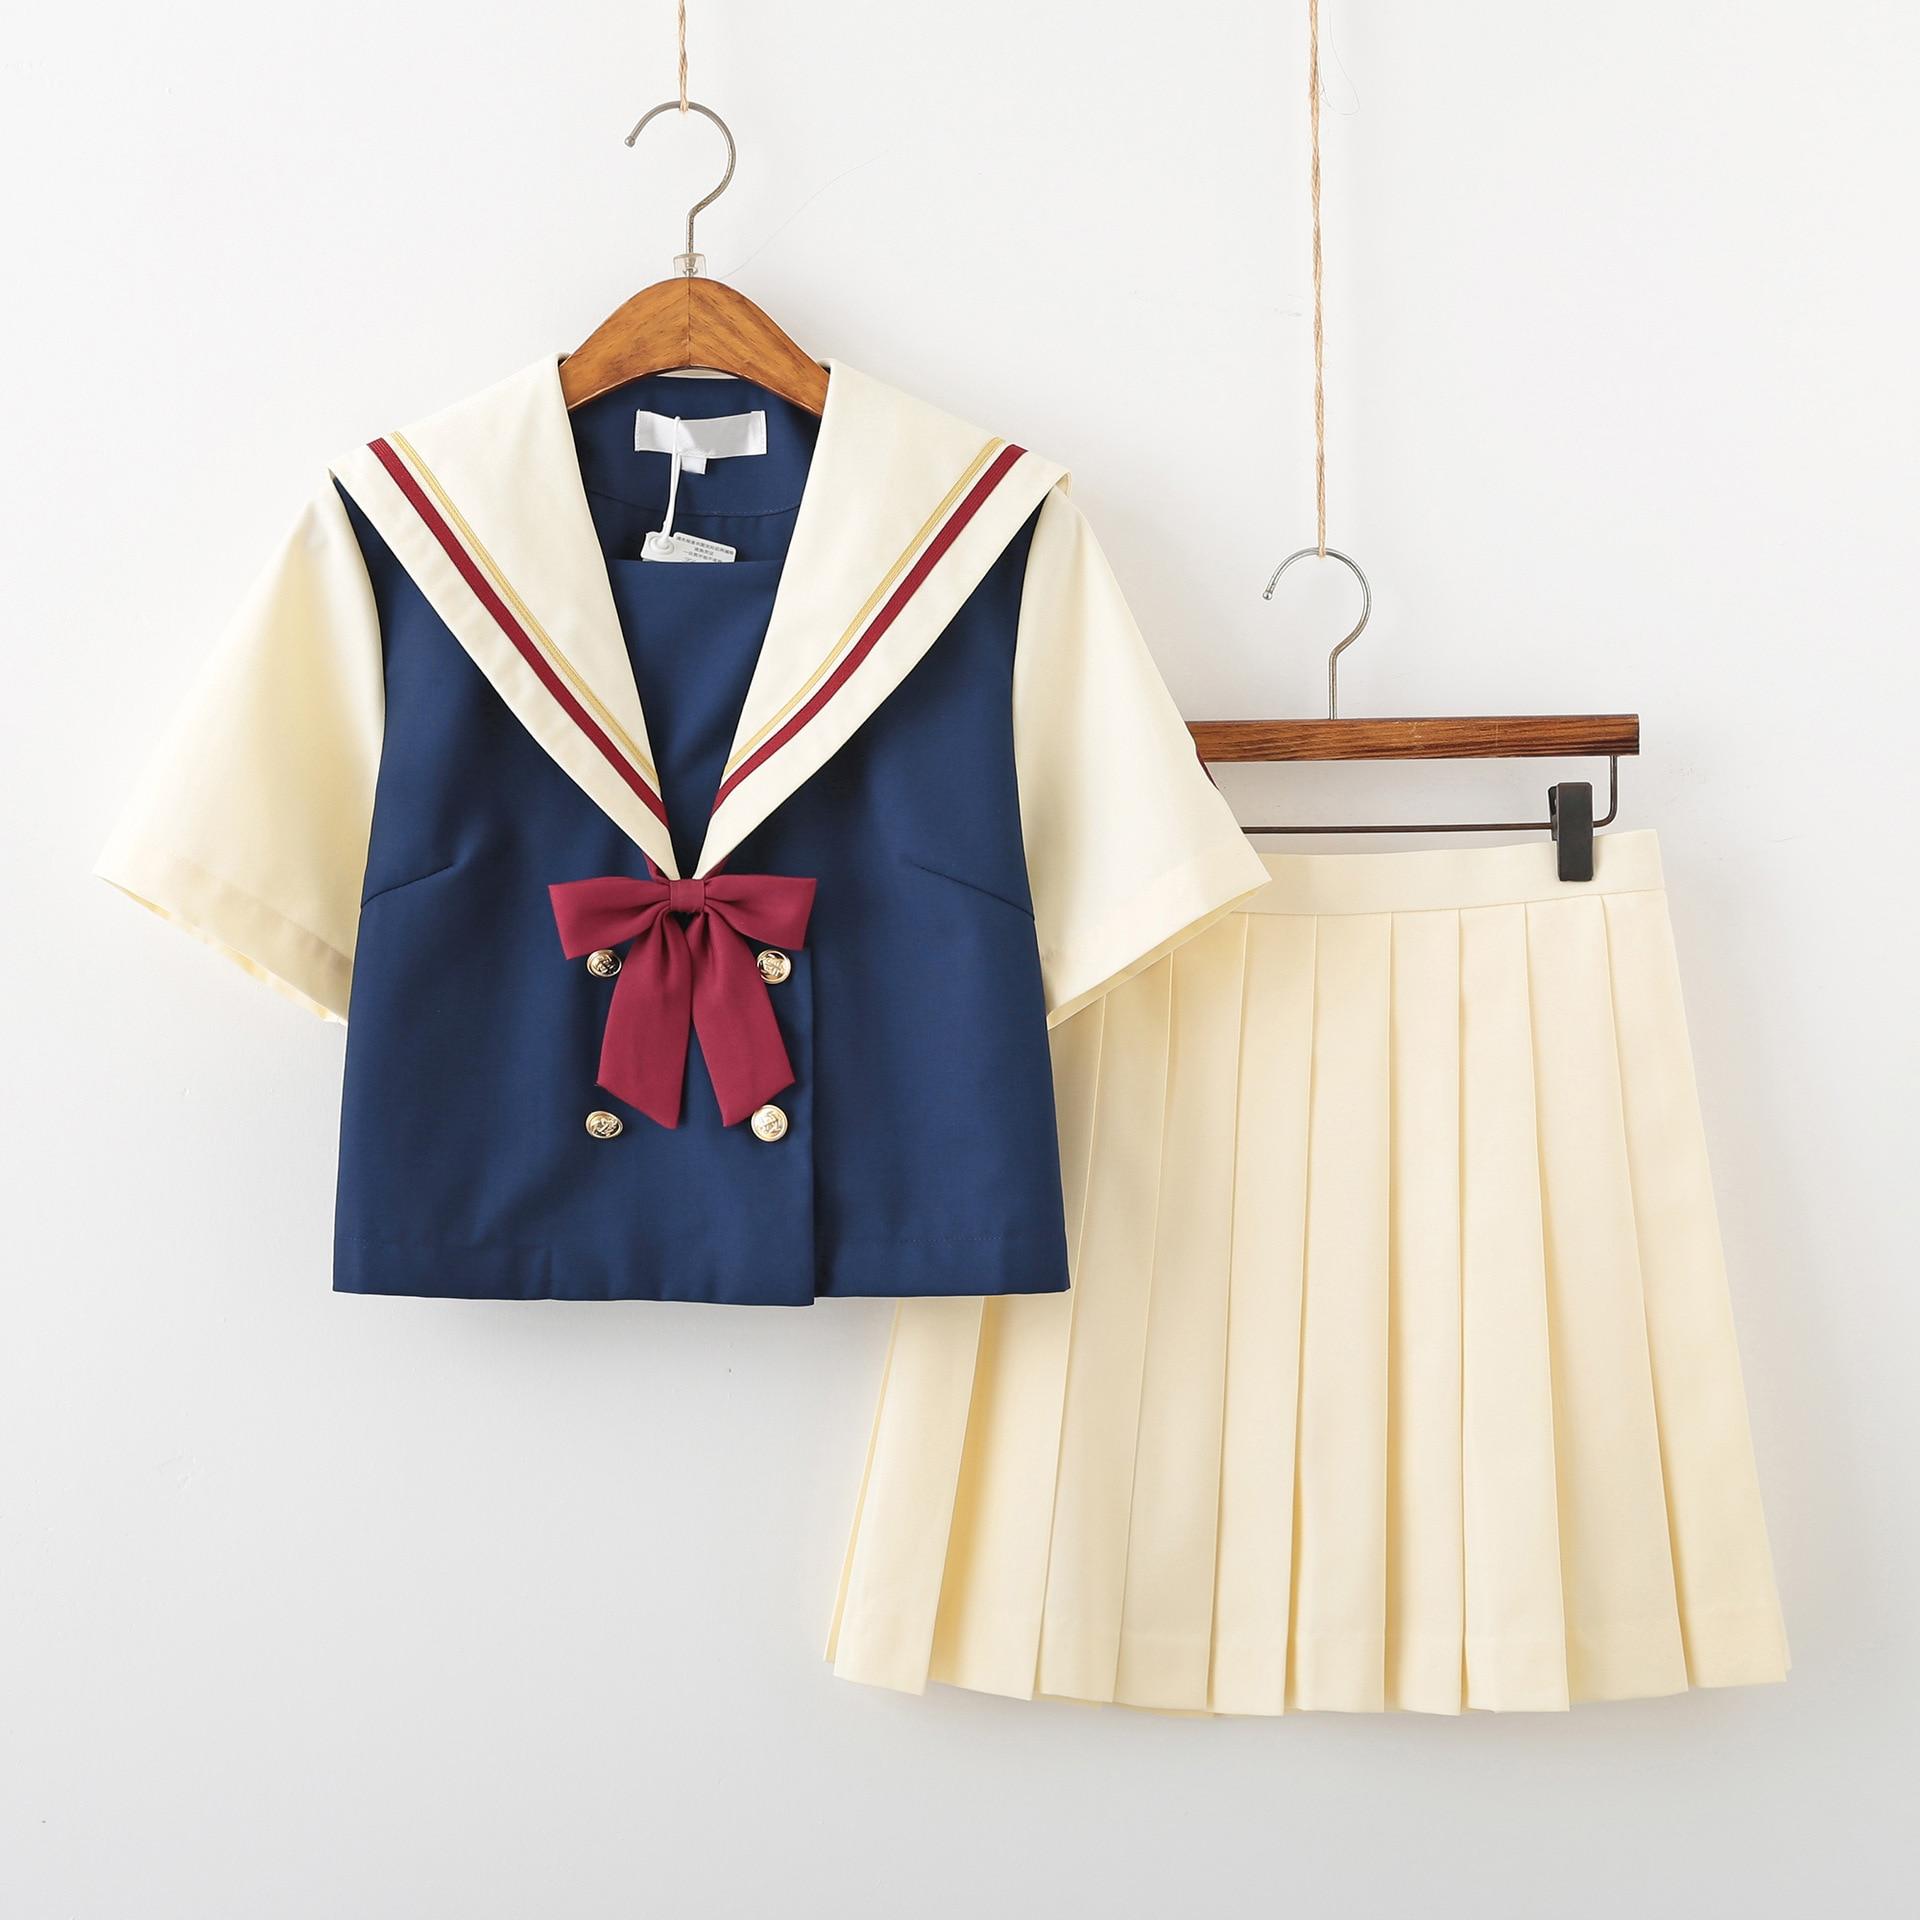 New Light Yellow School Uniforms Design Short And Long Sleeve Collage Student Sailors Uniforms Jk Cosplay